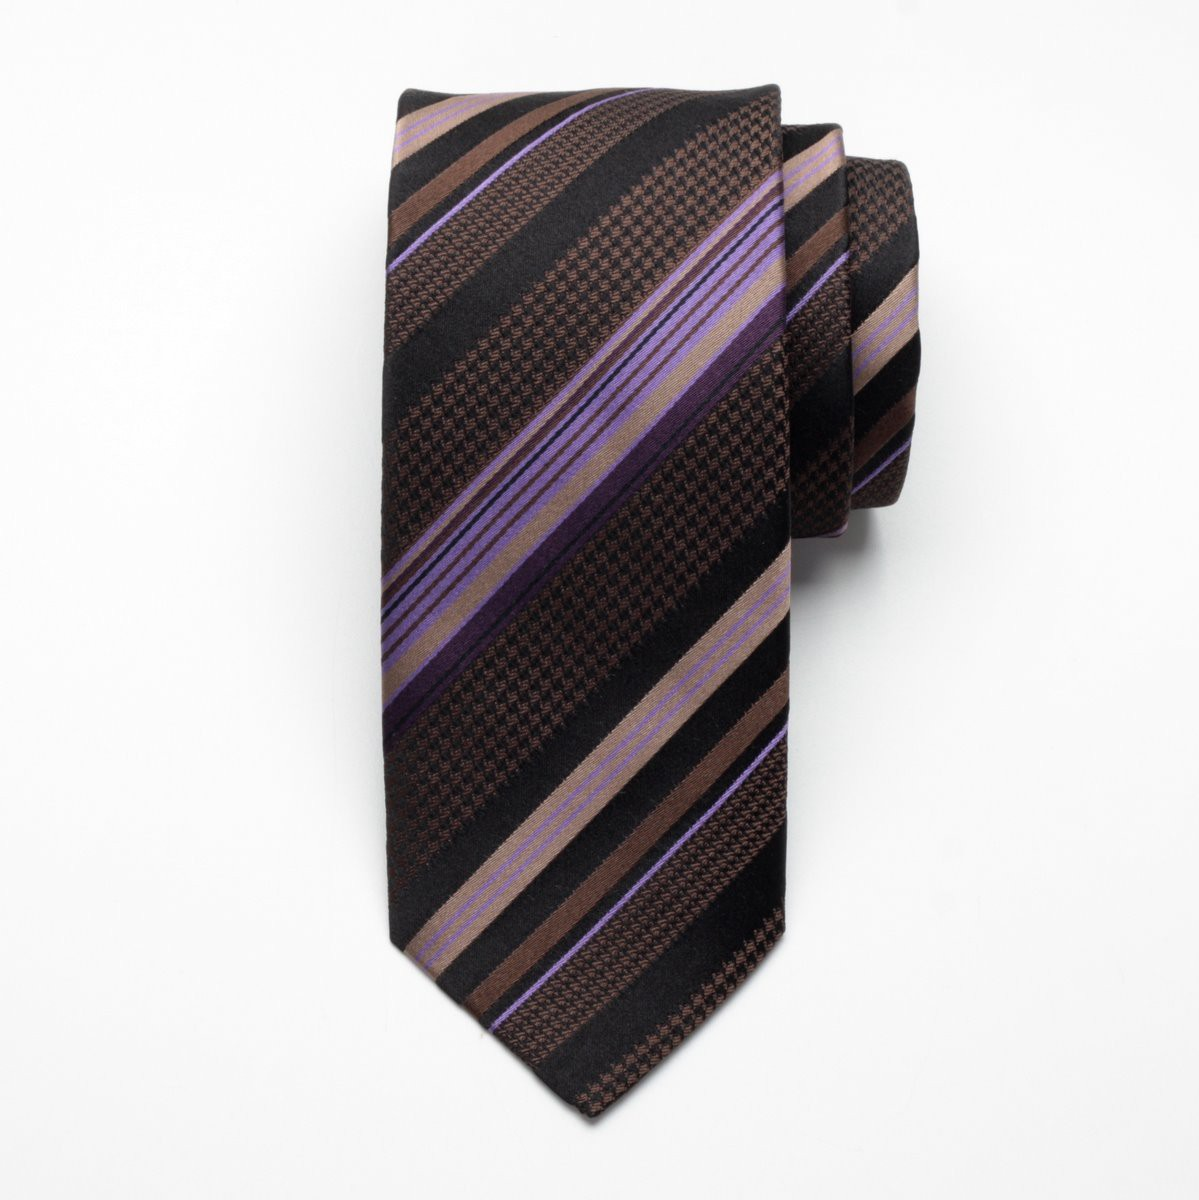 Krawat jedwabny Fine Selection (wzór 89)